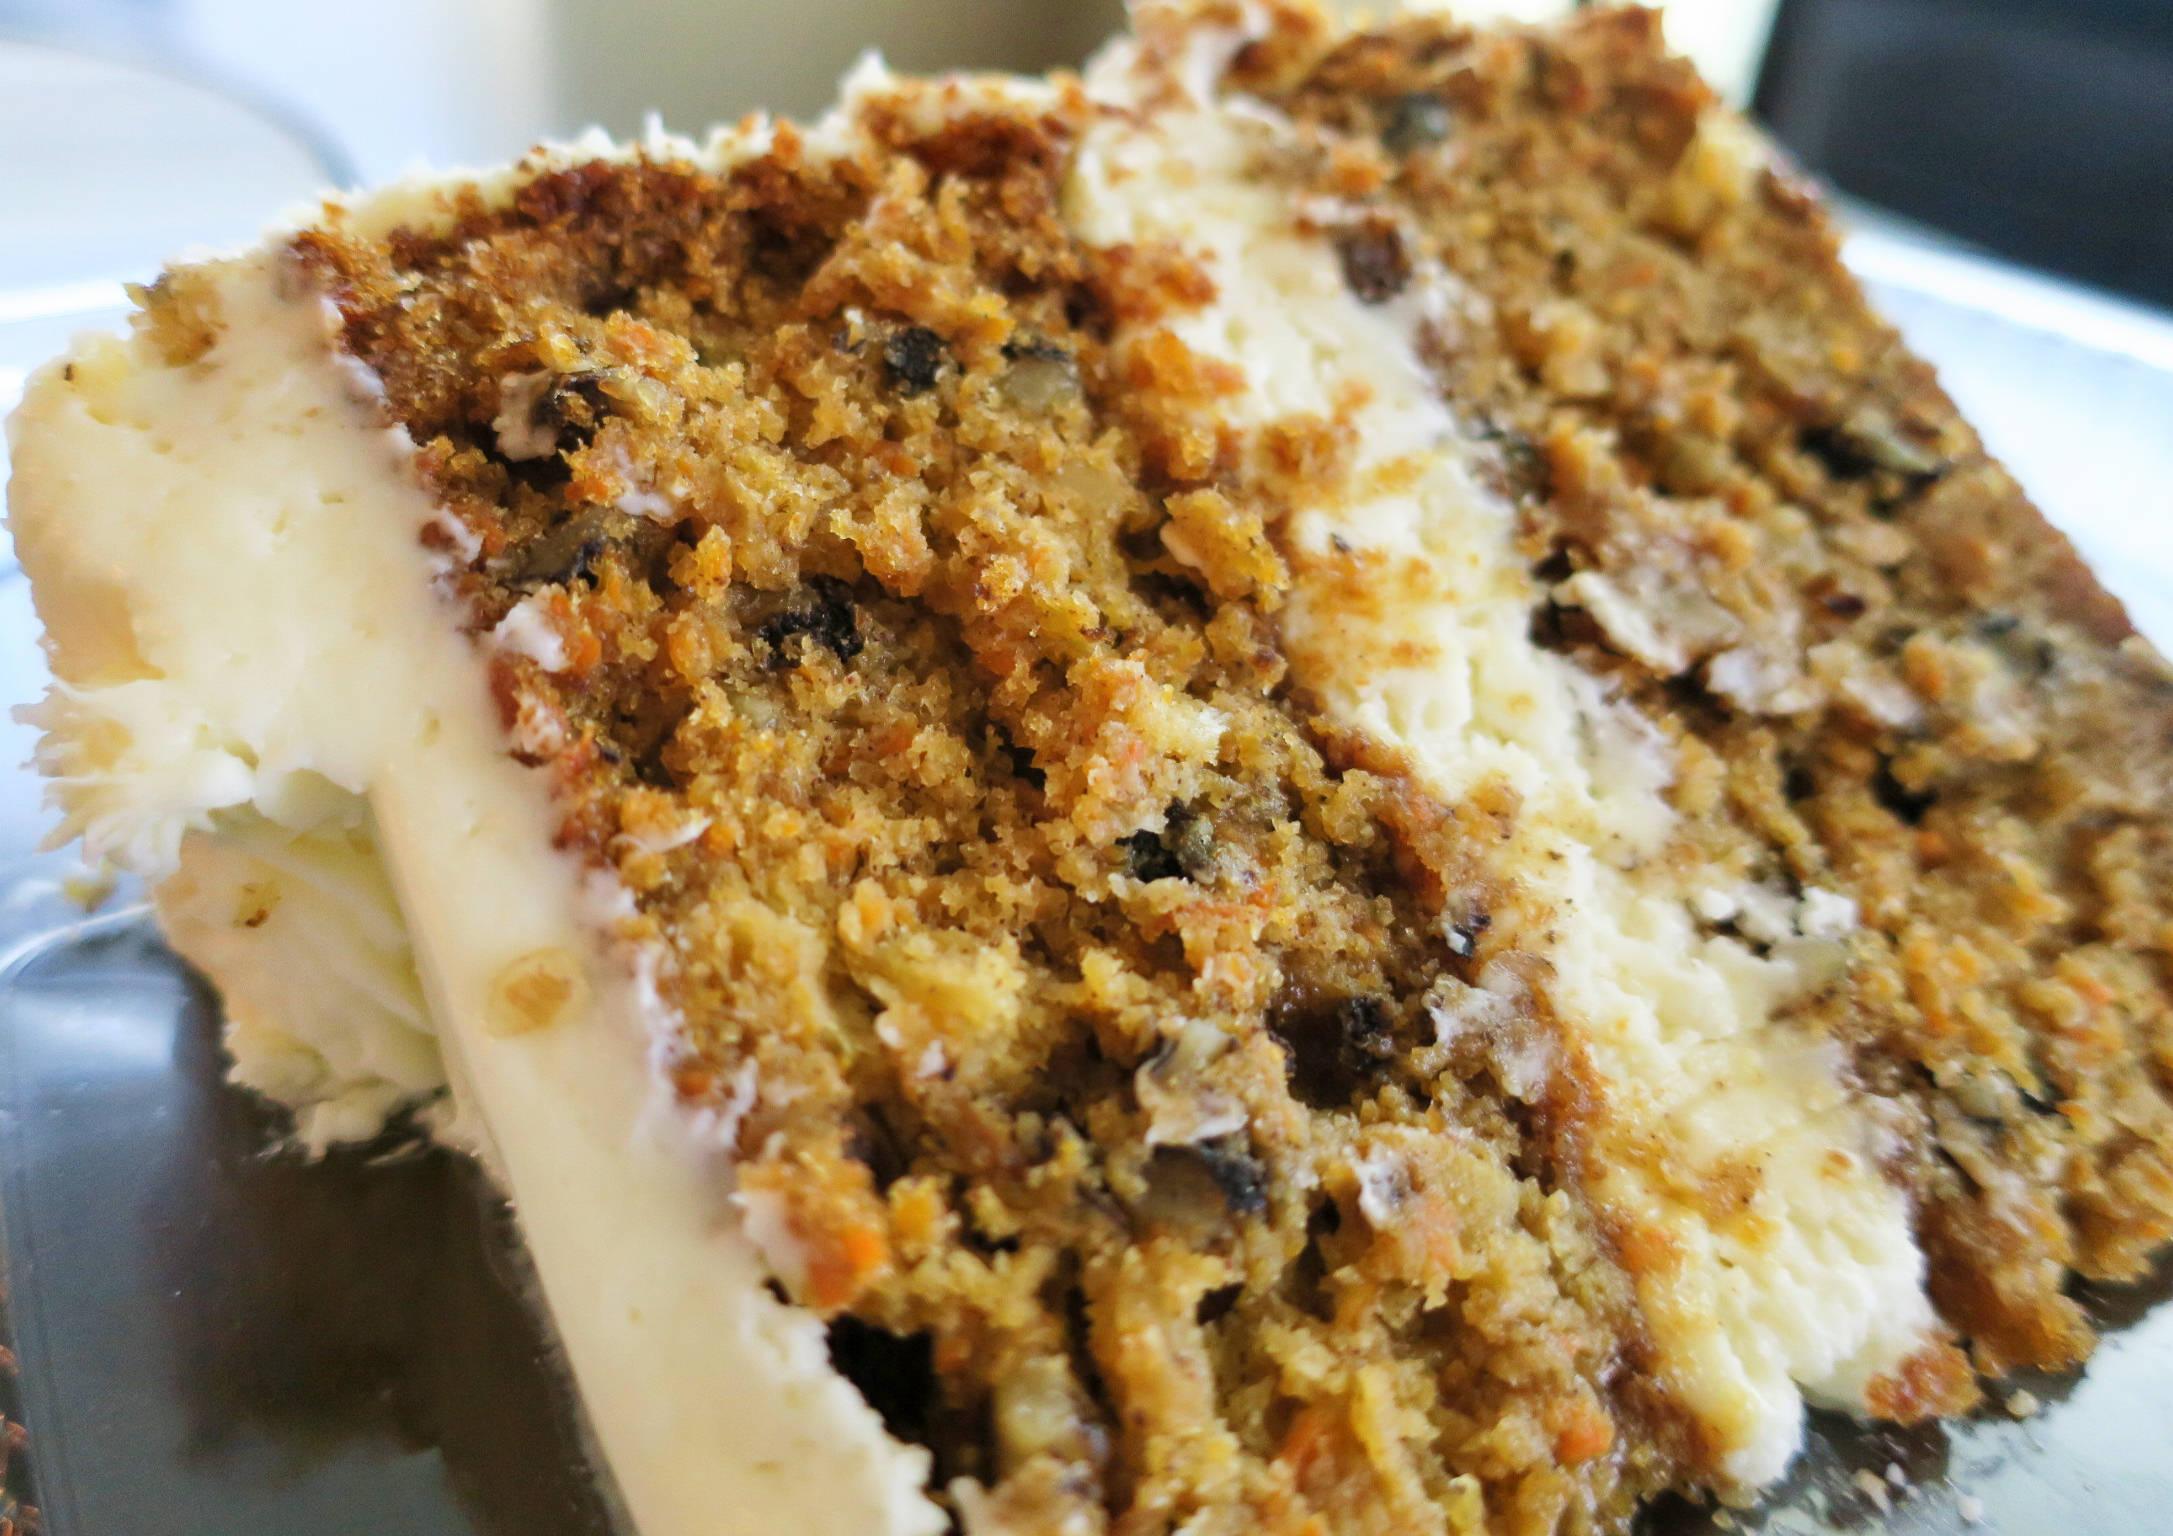 Carrot Cake - Ooh La La The Dessert Boutique, Houston, TX